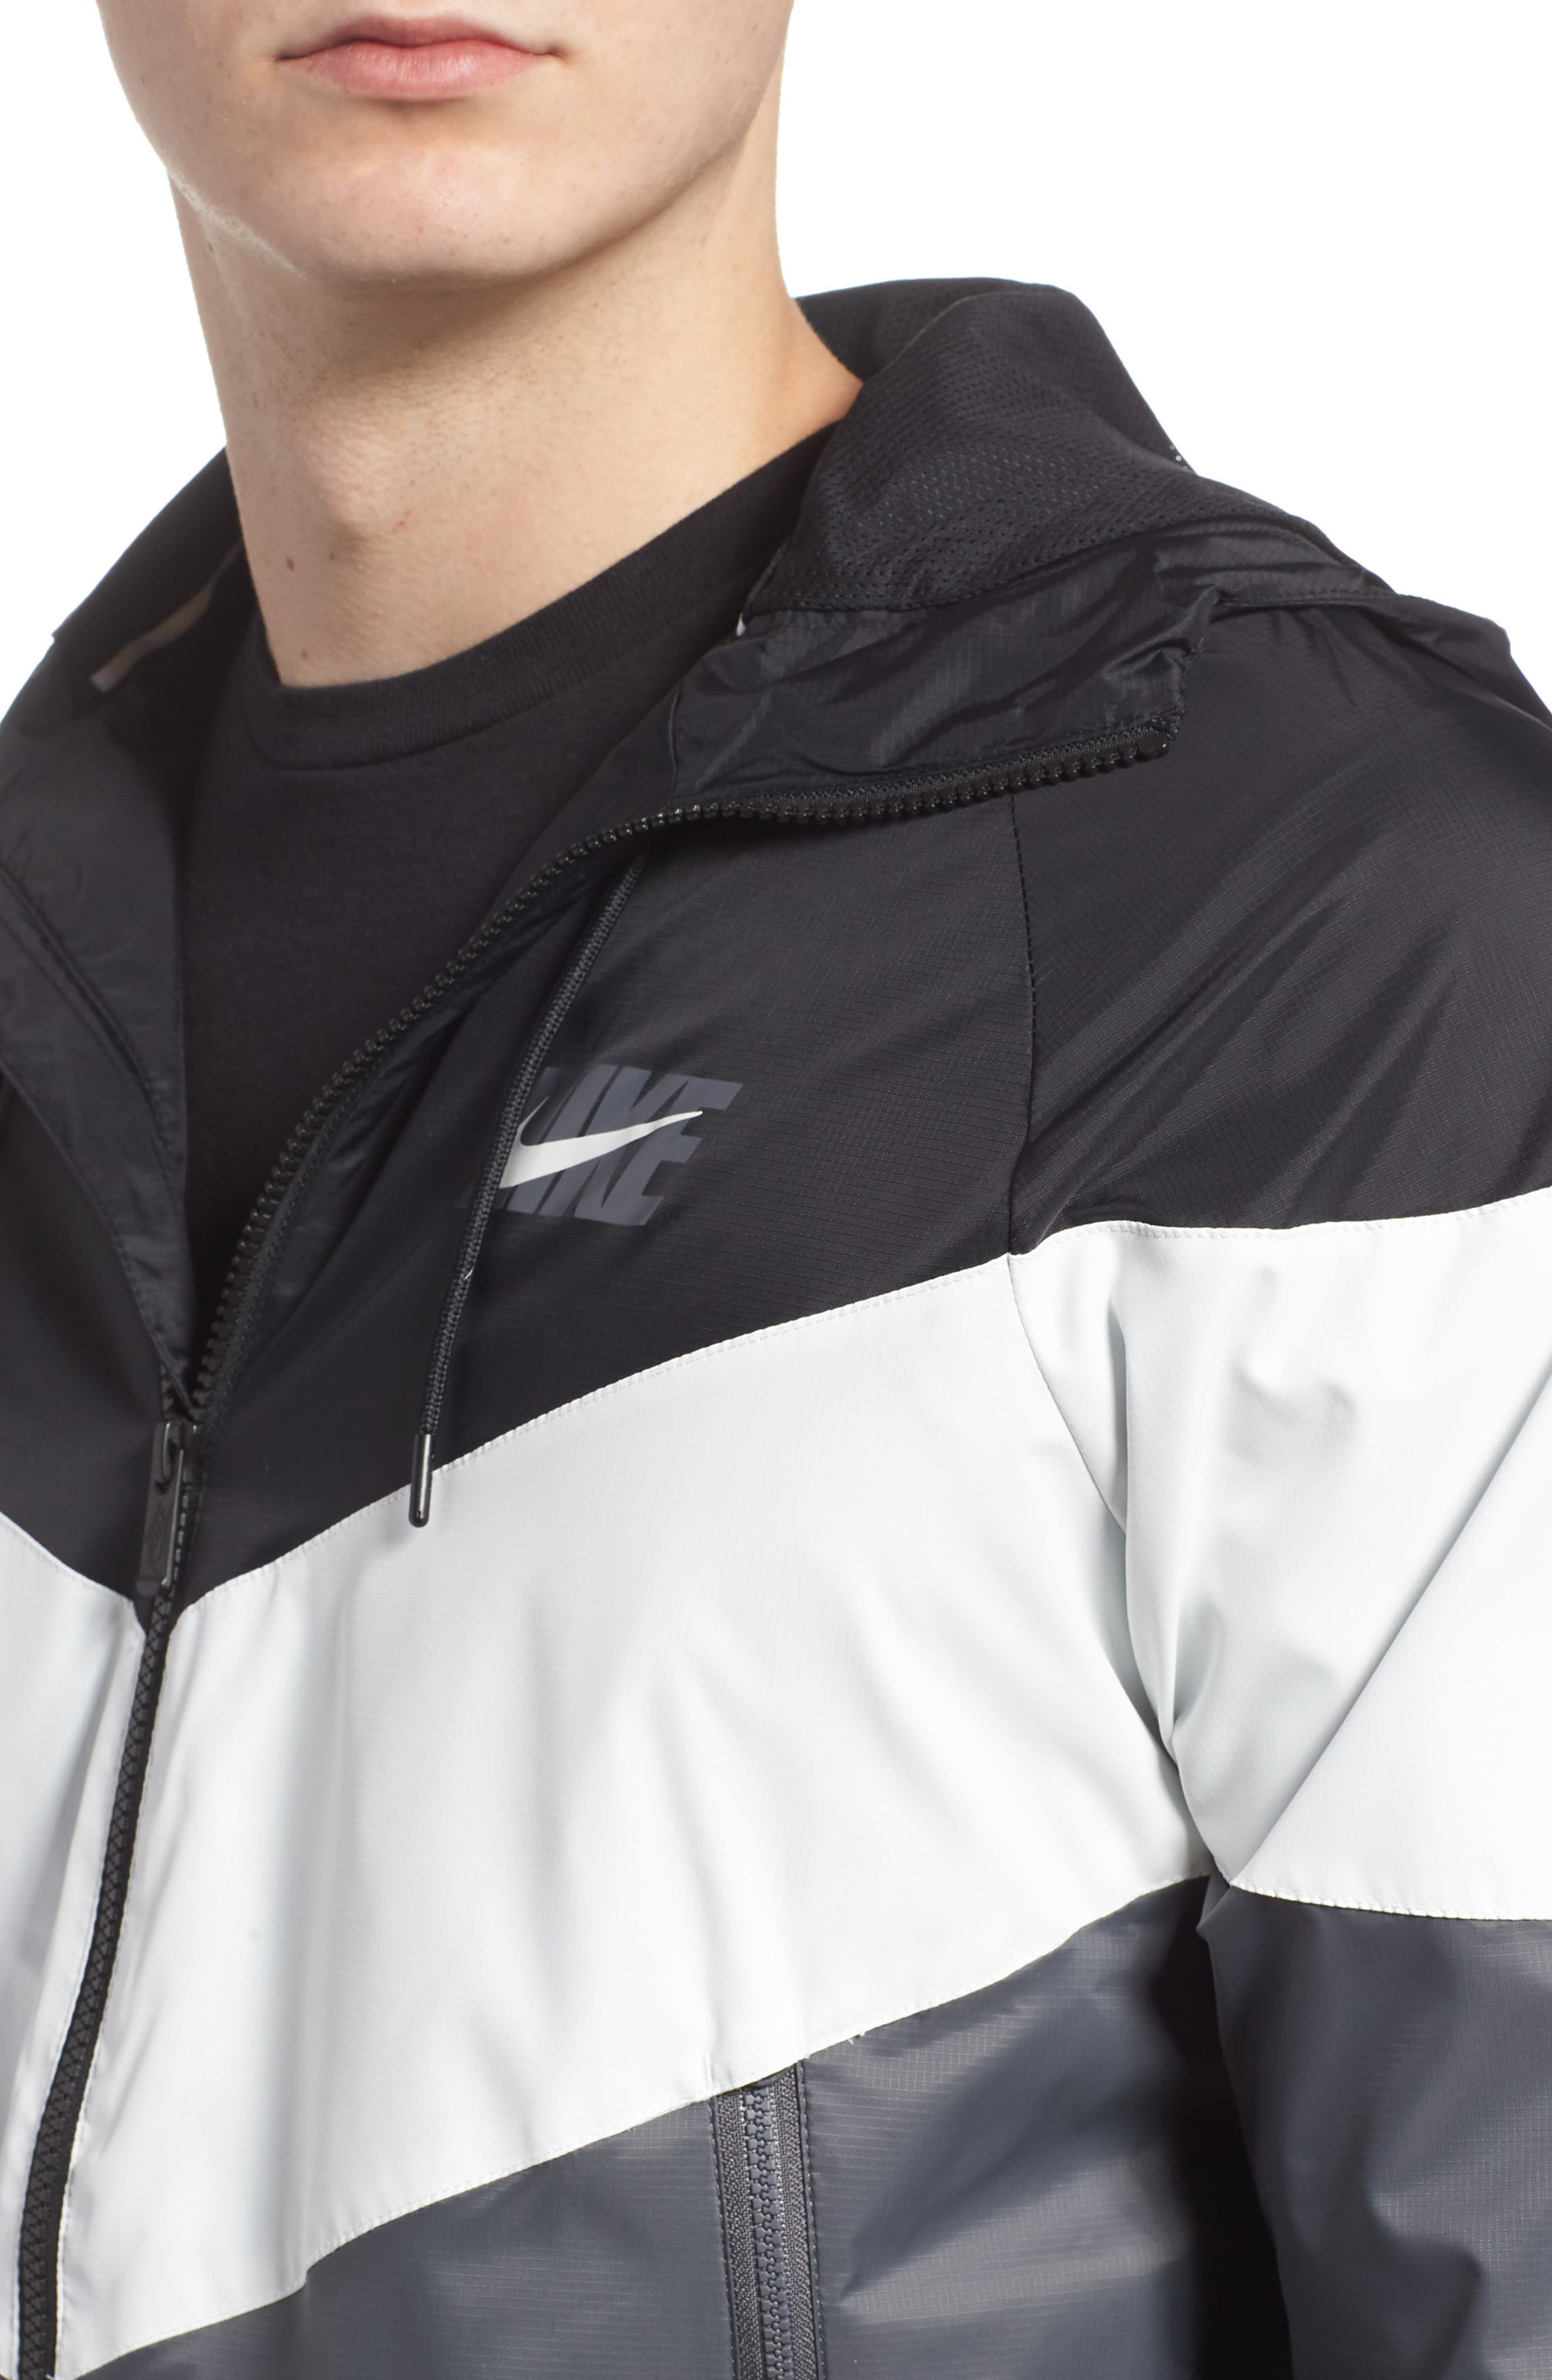 Windrunner Wind & Water Repellent Hooded Jacket,                             Alternate thumbnail 4, color,                             BLACK/ SUMMIT WHITE/ DARK GREY